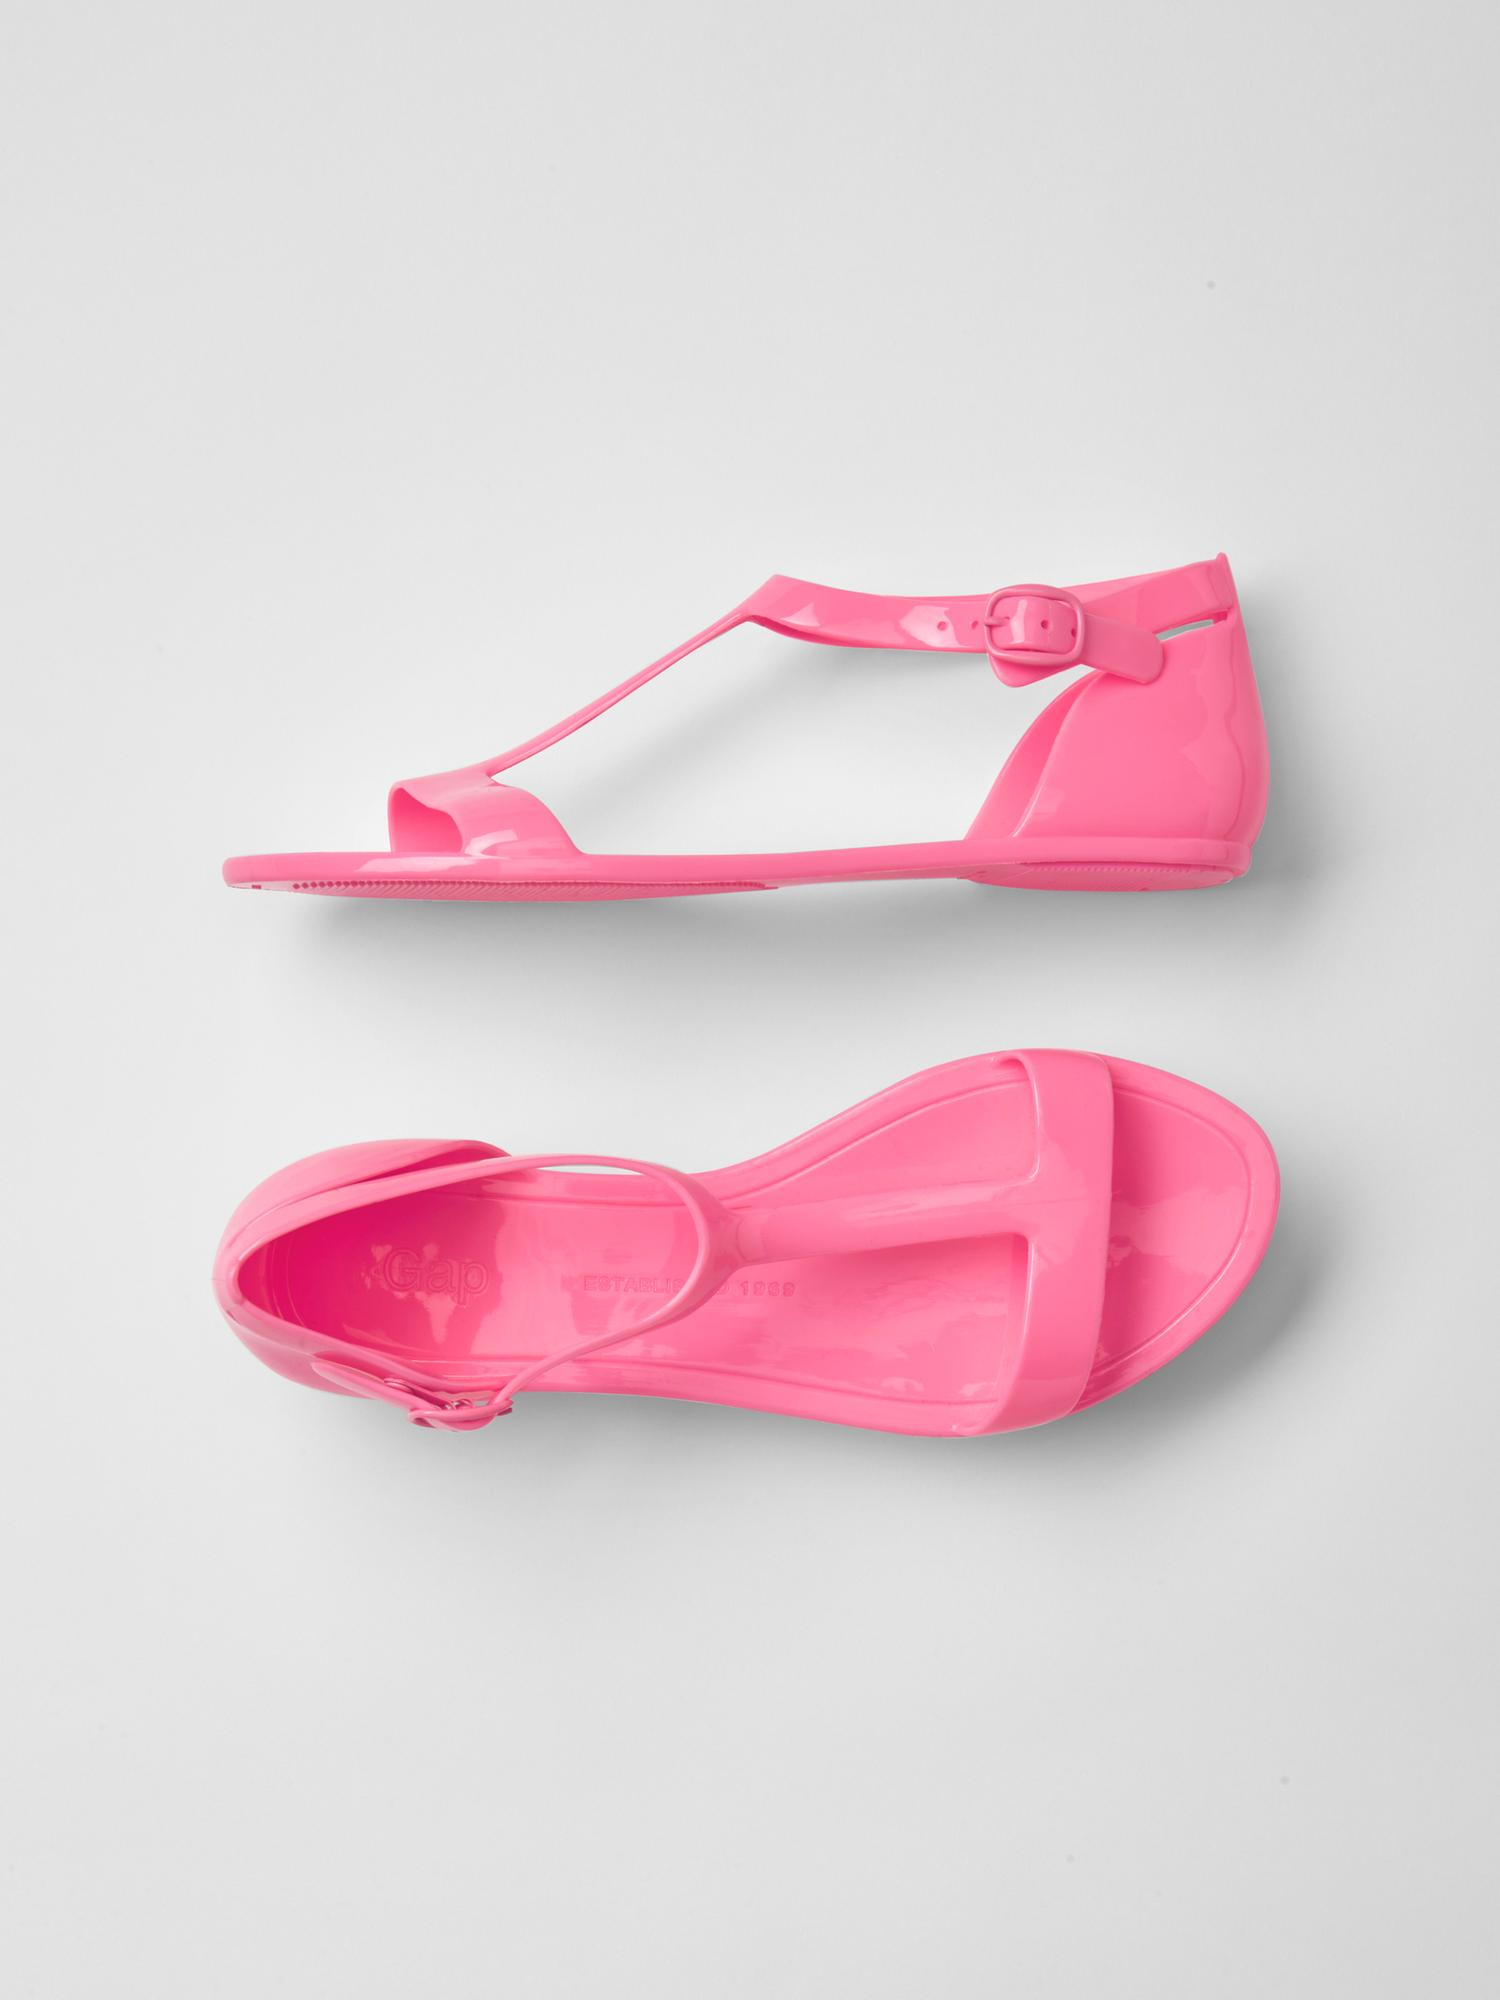 gap glitter t jelly sandals in pink neon impulsive